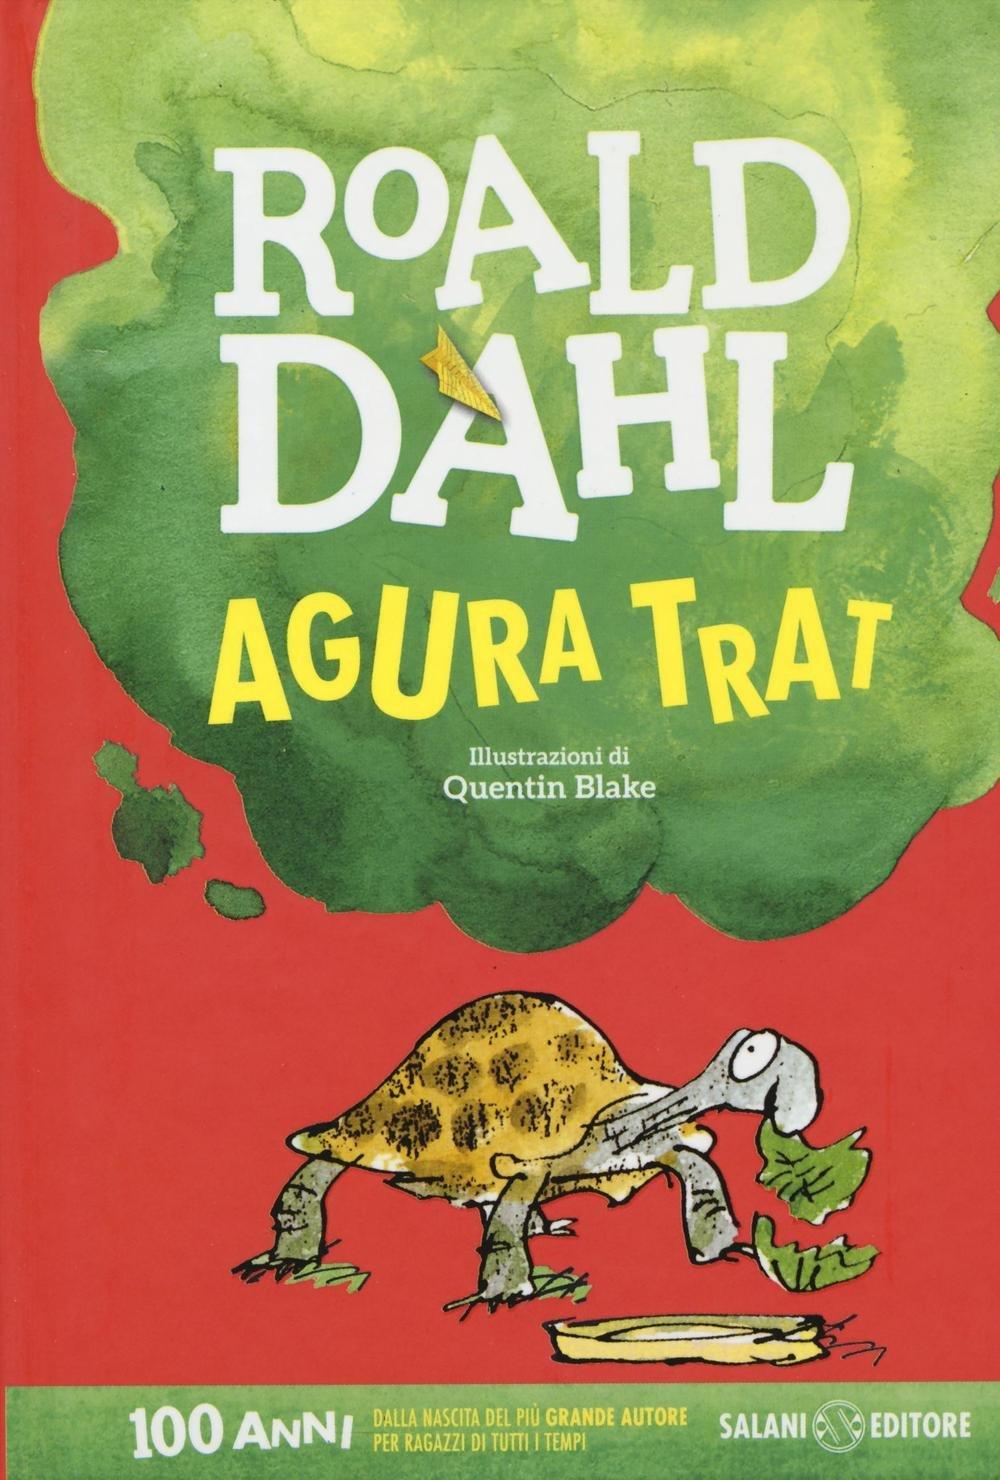 Amazon.it: Agura trat - Dahl, Roald, Blake, Q., Rotunno, A. - Libri